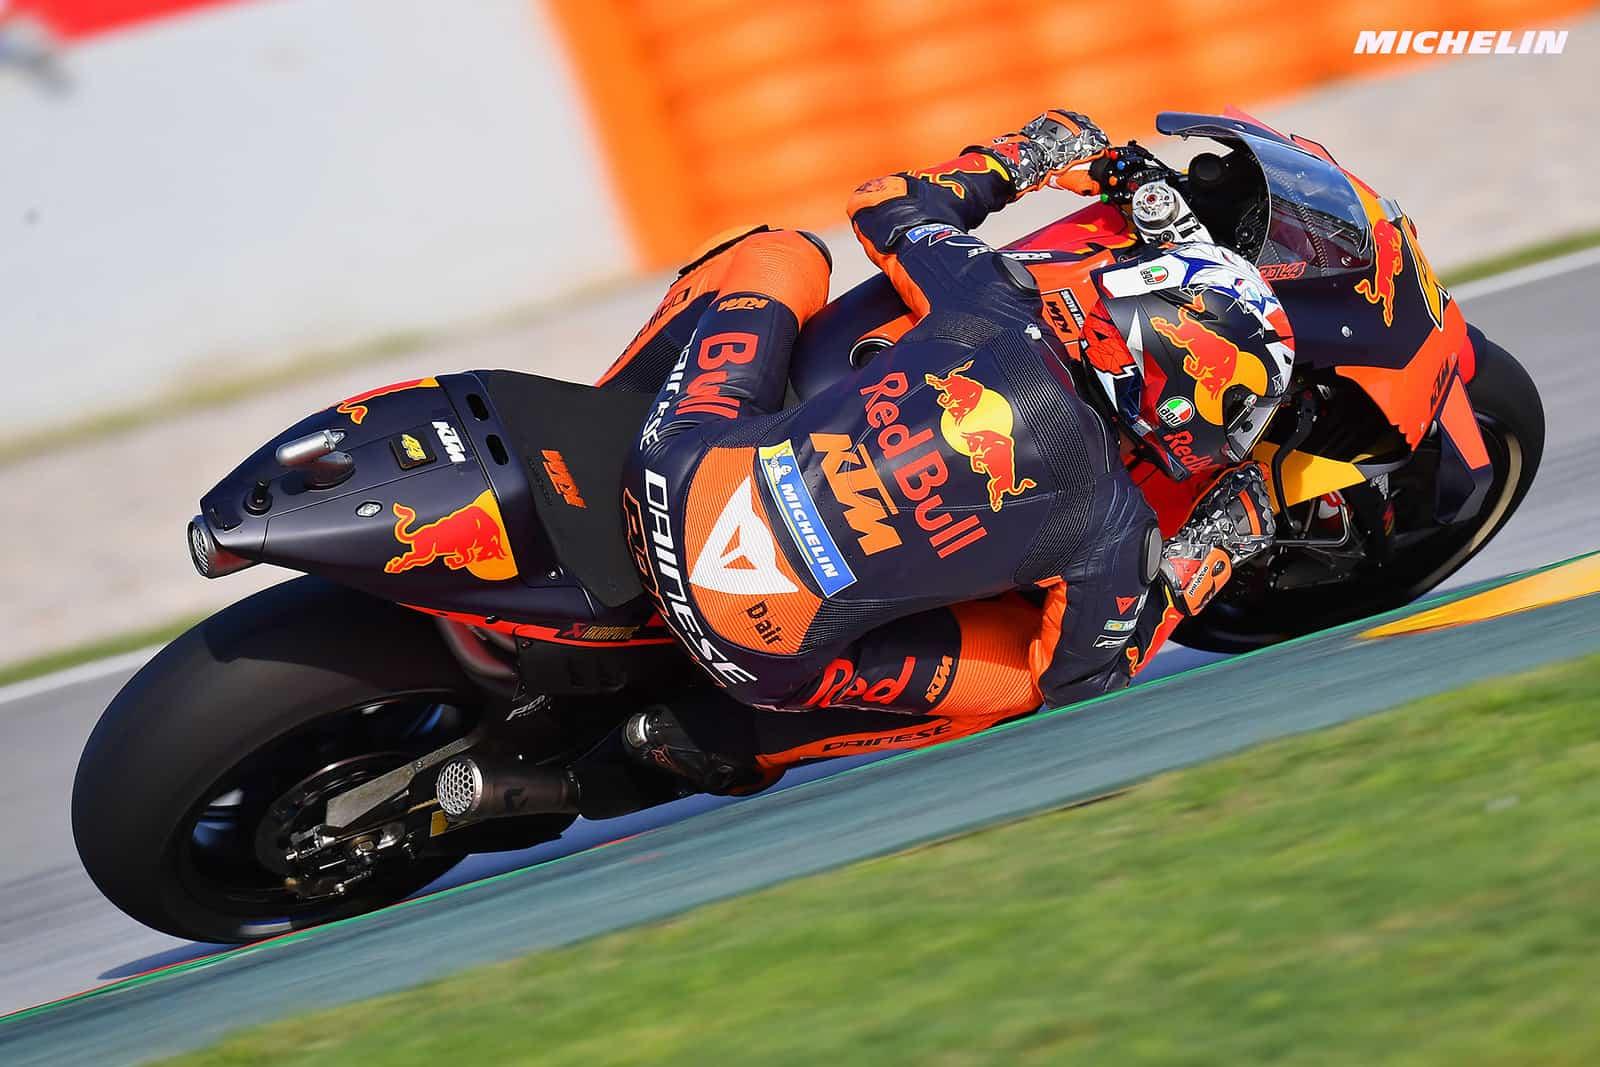 MotoGPポルティマオテスト 初日セッションライダーコメント KTM